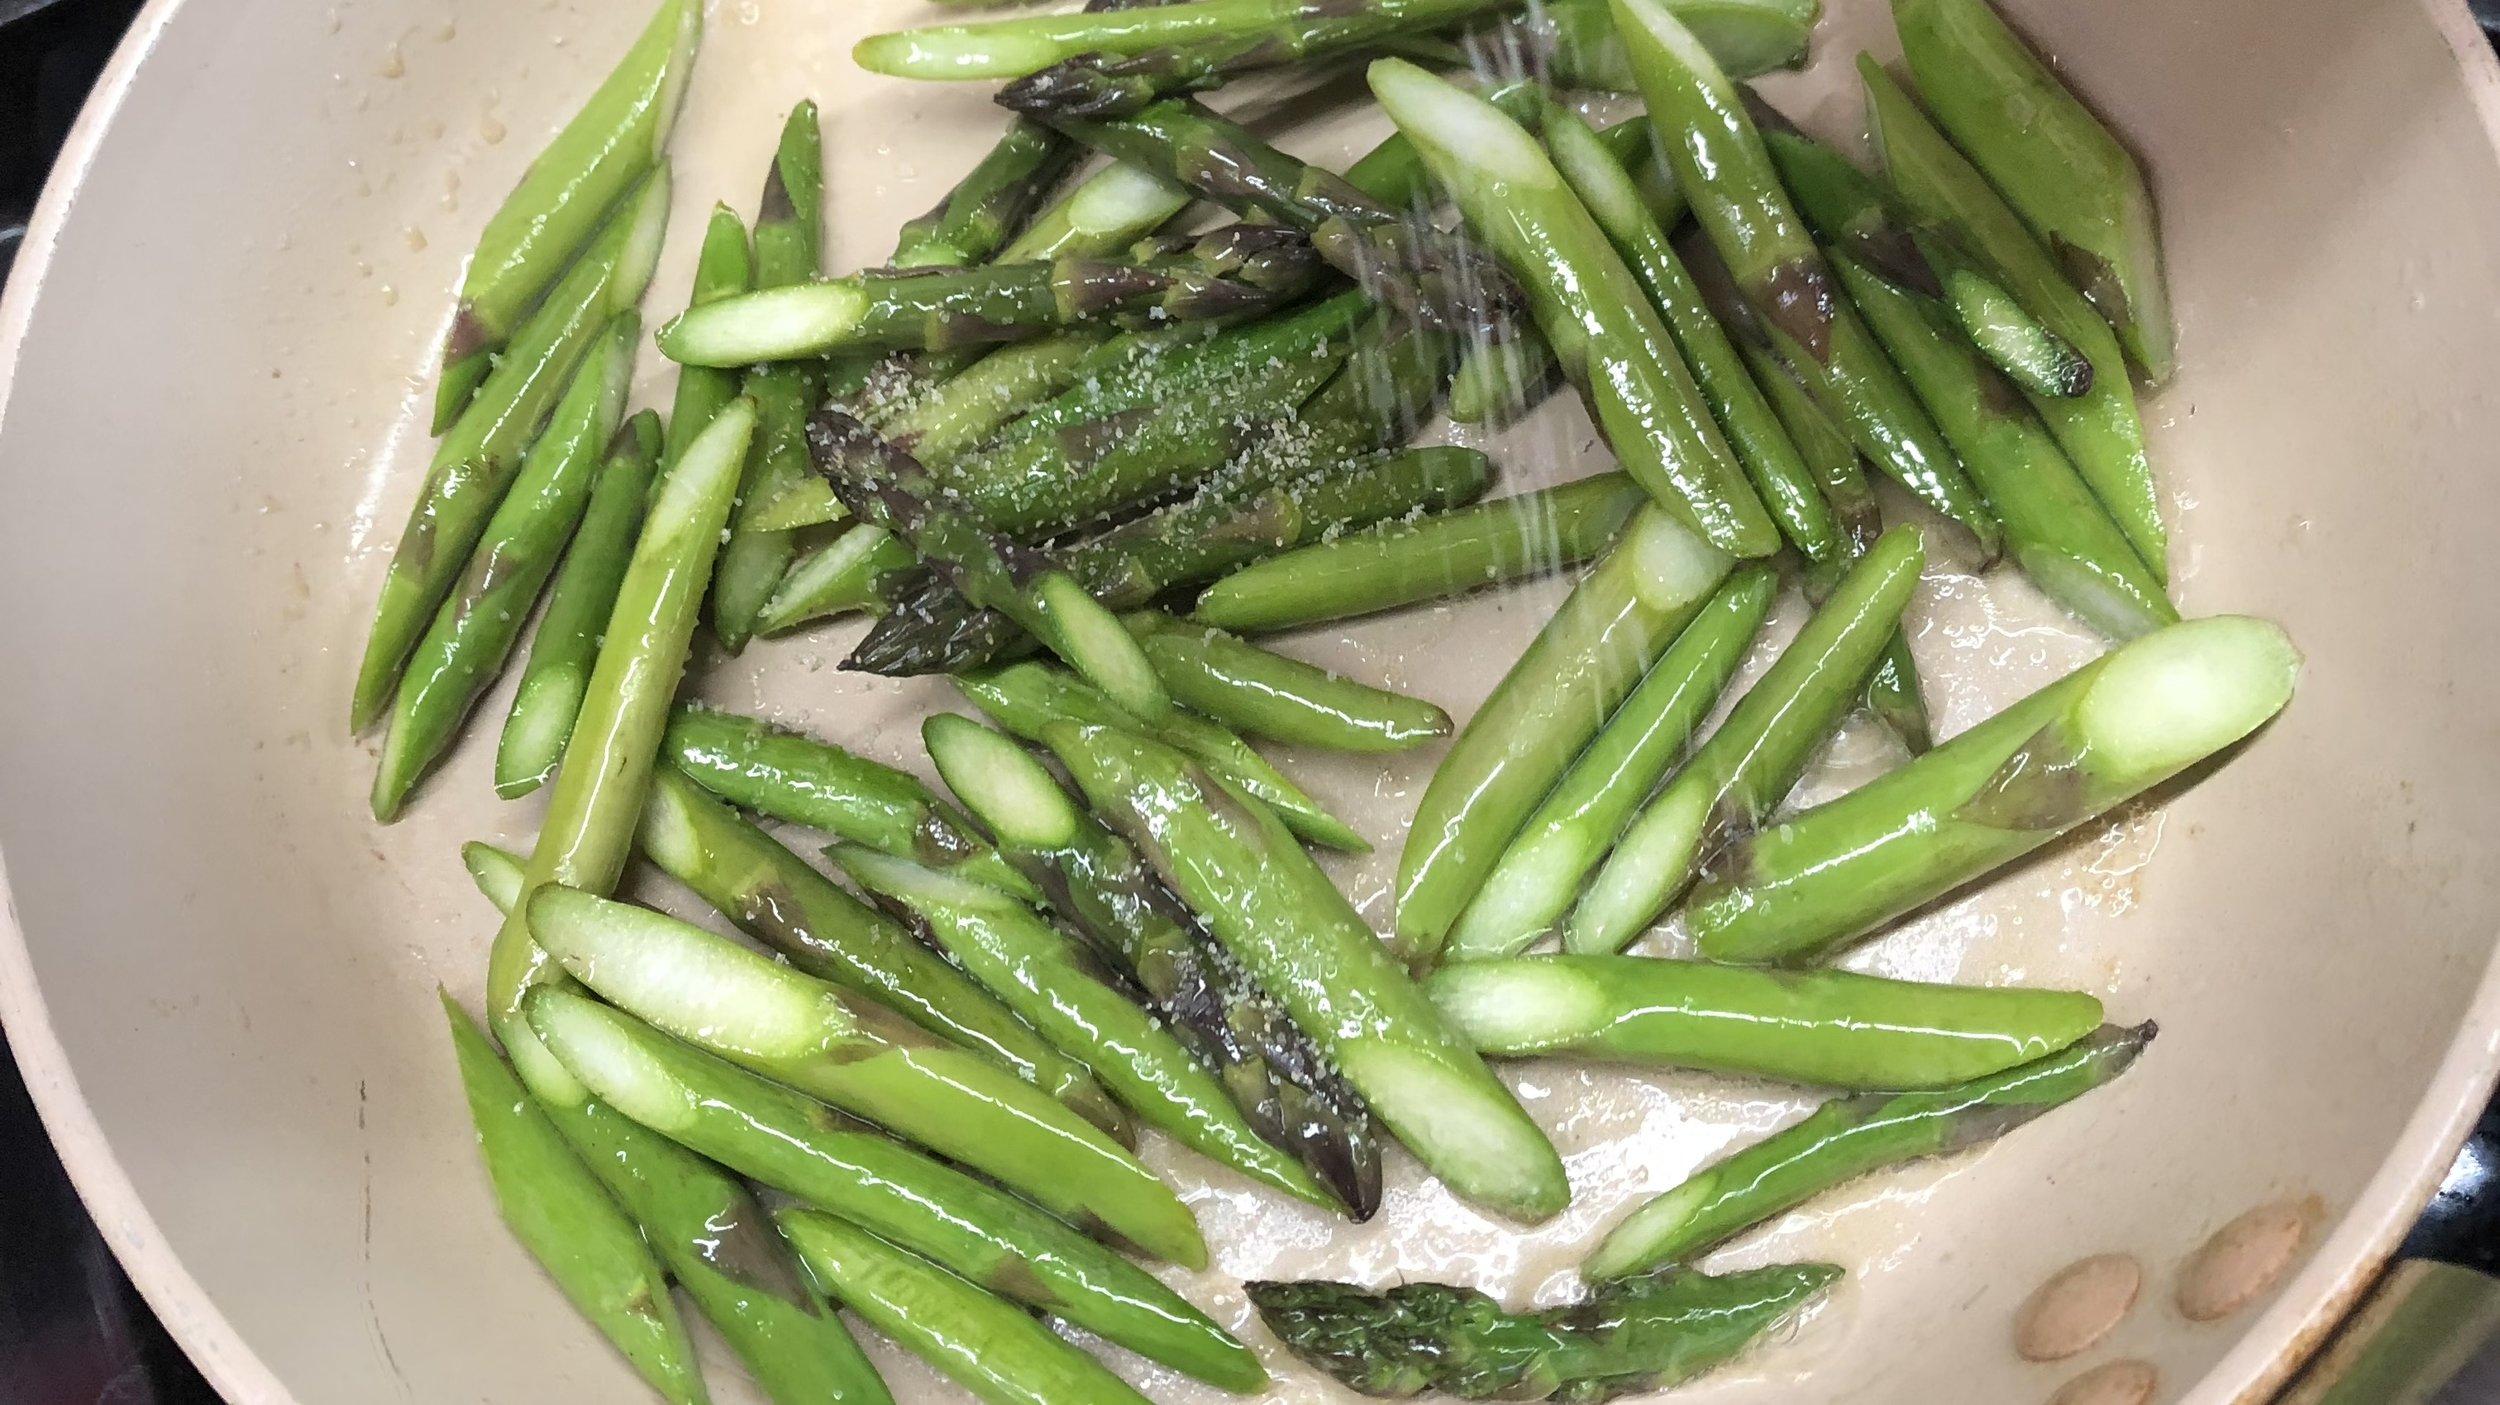 Asparagus Roasting 16x9 Cooking step.jpg